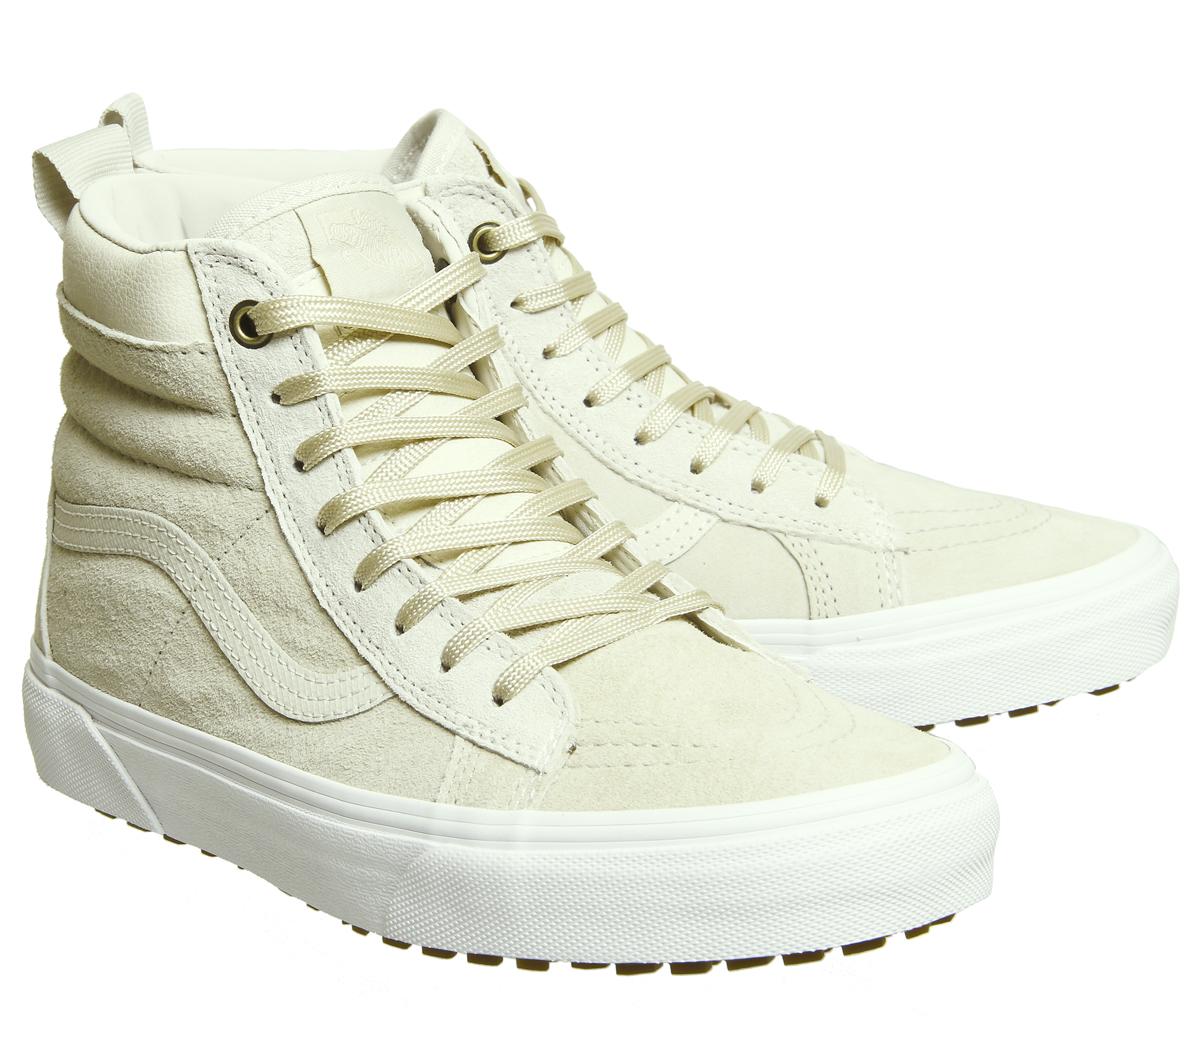 Shoes Womens Hi Cement Sk8 Ebay Trainers Mte Vans Birch FF0ZxqSr